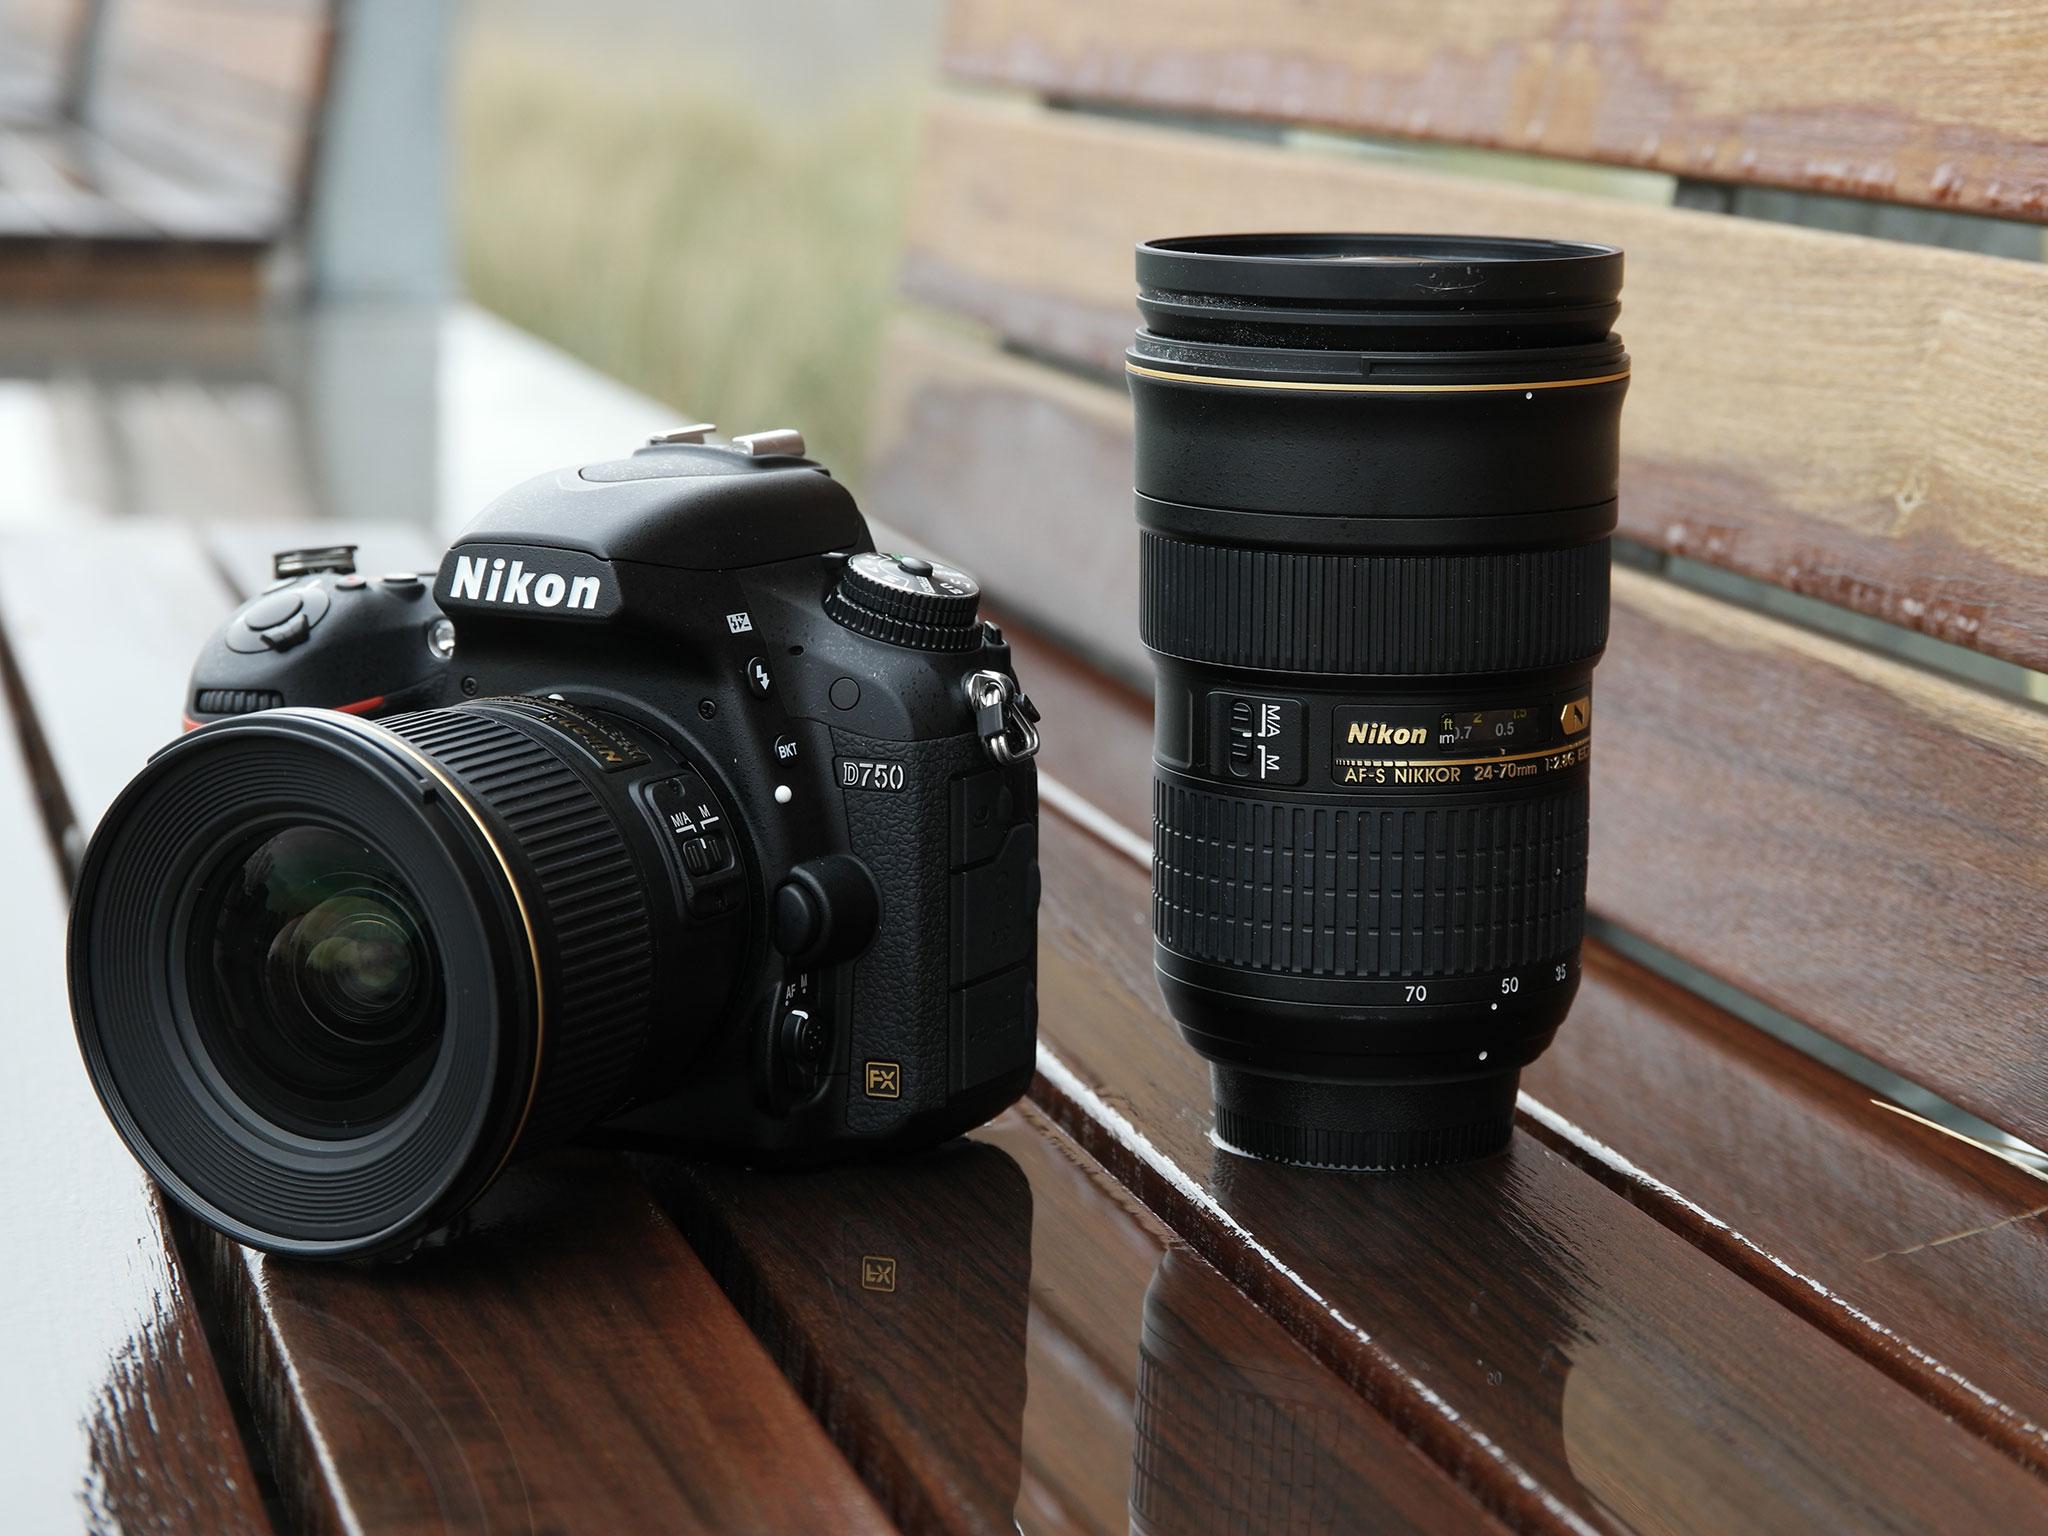 Nikon D750 Vs Canon Eos 6D Mark II : Which is Better Choice?